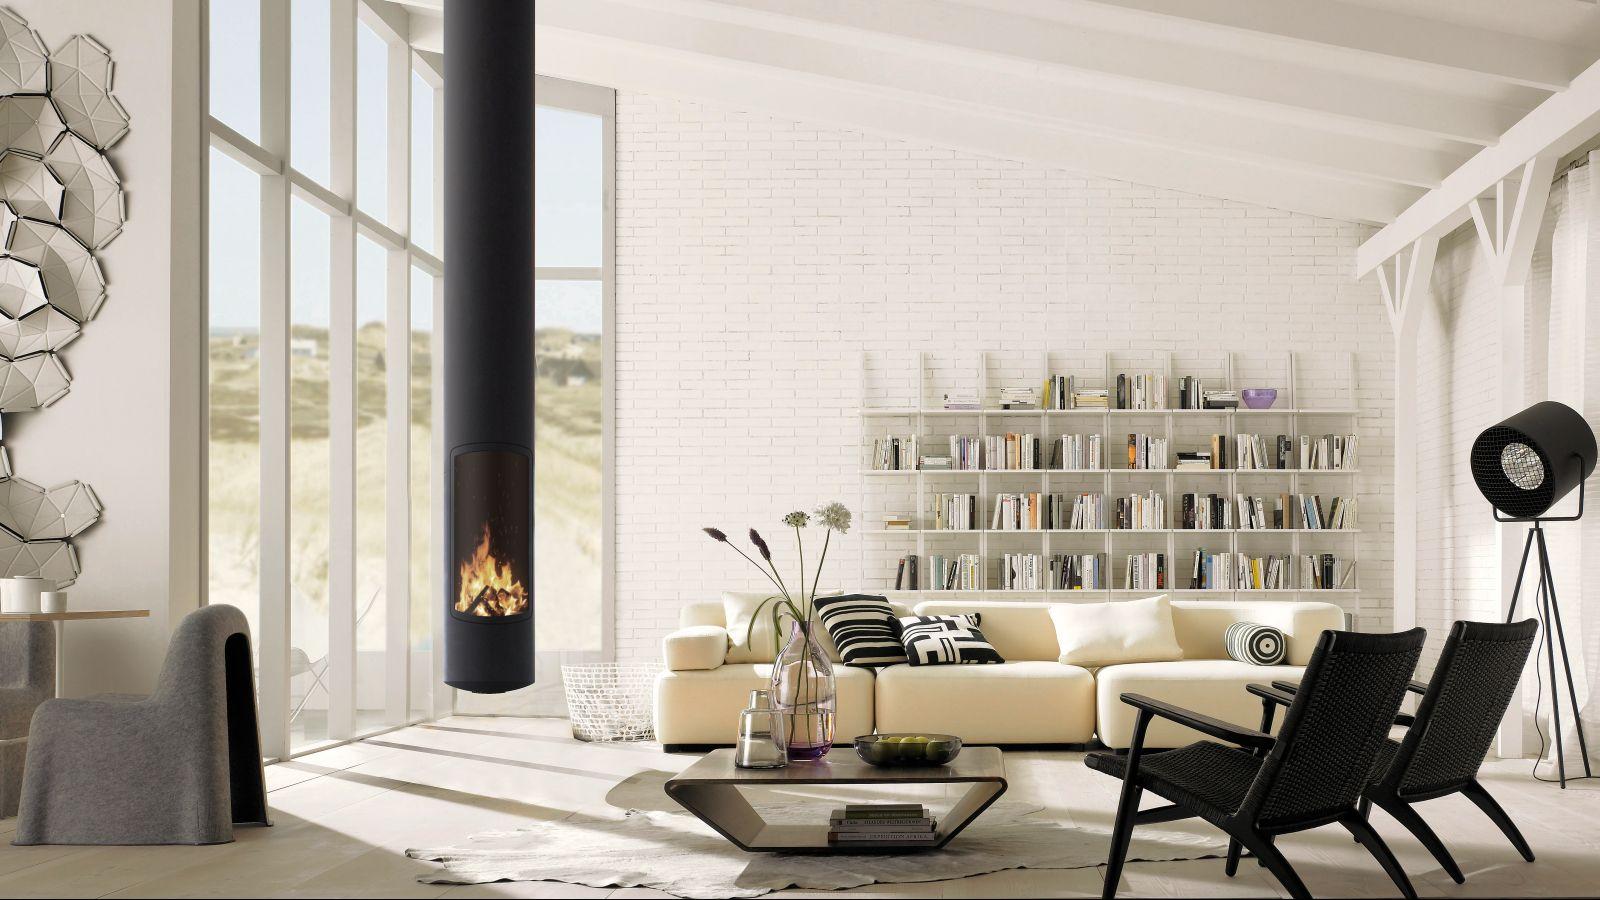 slimfocus focus. Black Bedroom Furniture Sets. Home Design Ideas